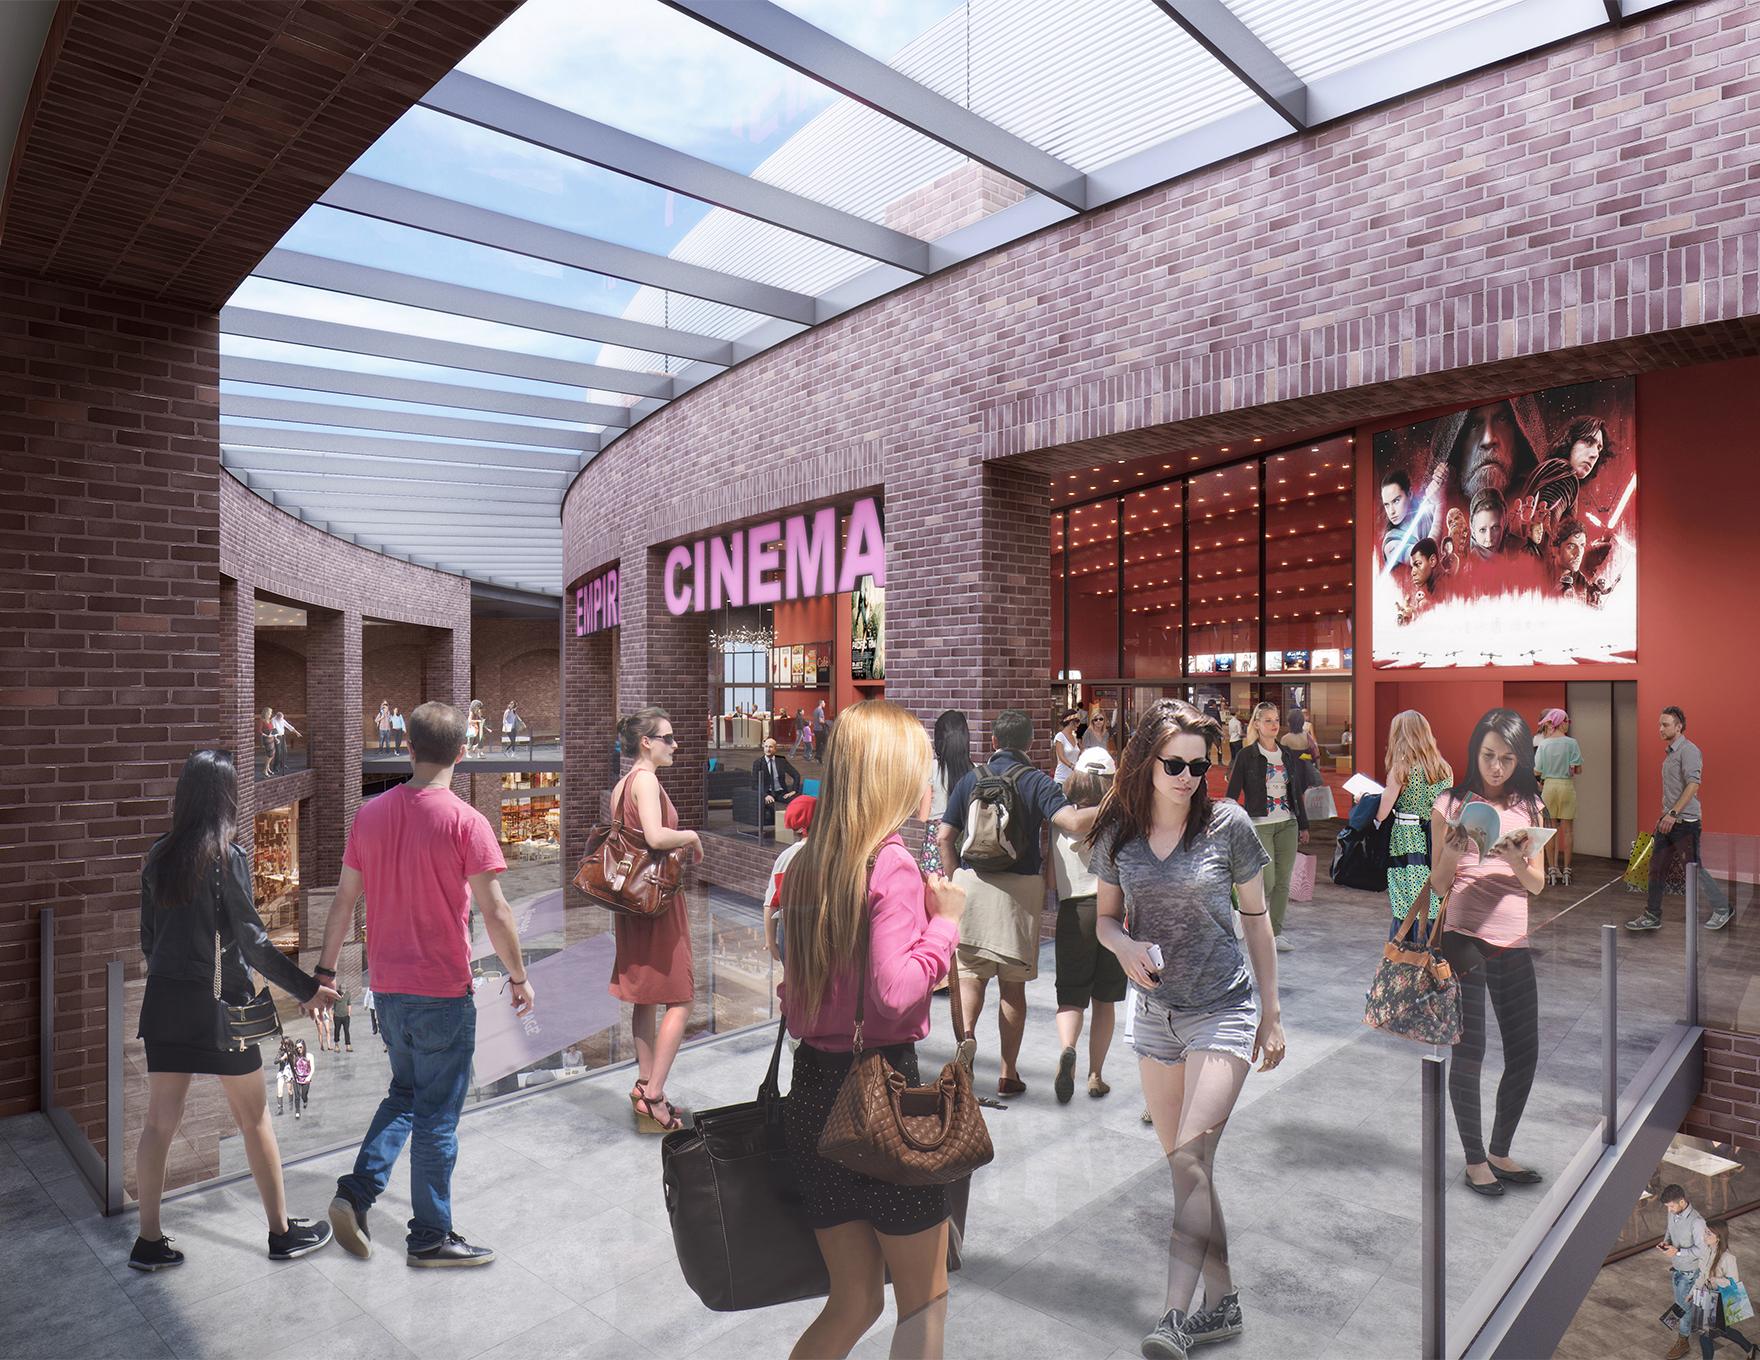 Swindon Snow Centre Indoor Snow Ski Slope Leisure Destination Cinema Entrance View L